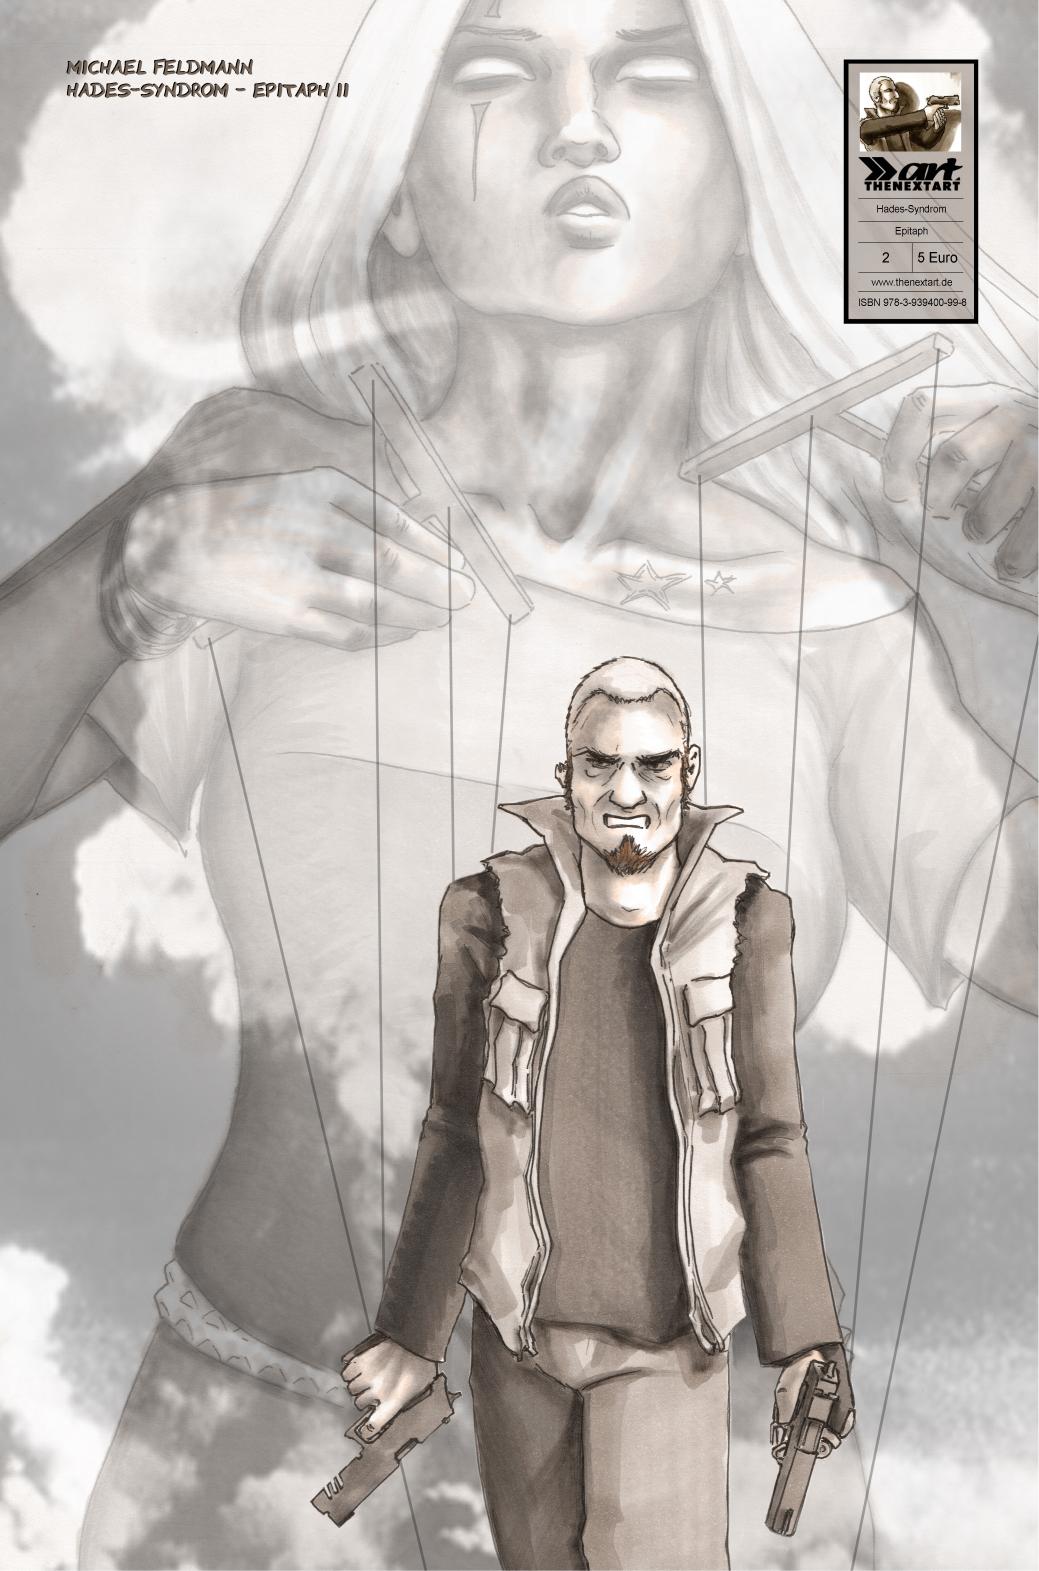 Michael Feldmann Hades-Syndrom – Epitaph 2 Cover